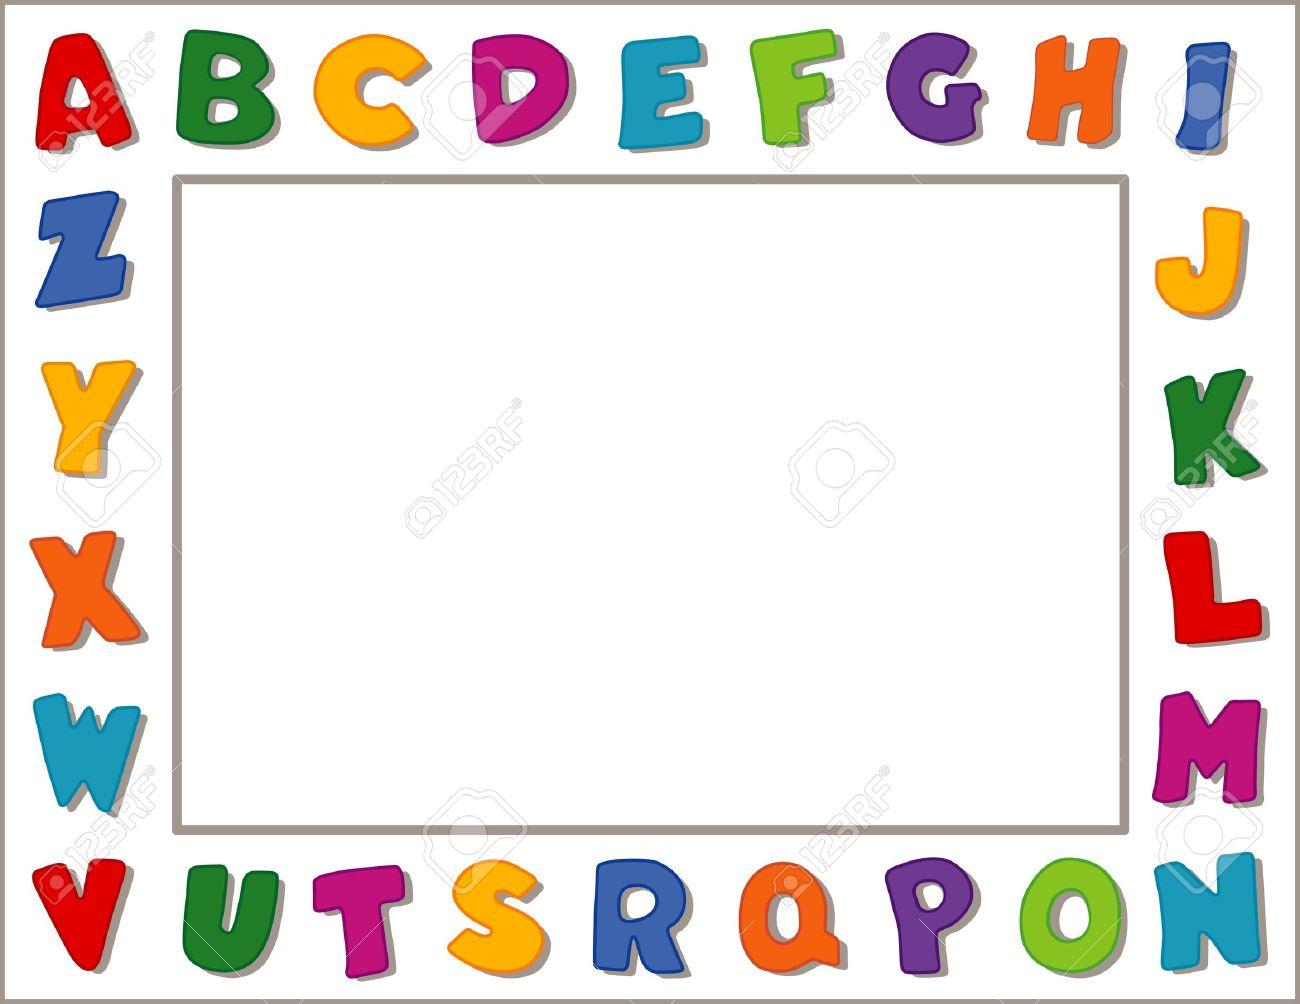 Printables Alphabets For Kindergarten worksheet alphabets for kindergarten mikyu free alphabet frame white background royalty cliparts vectors stock vector 13285819